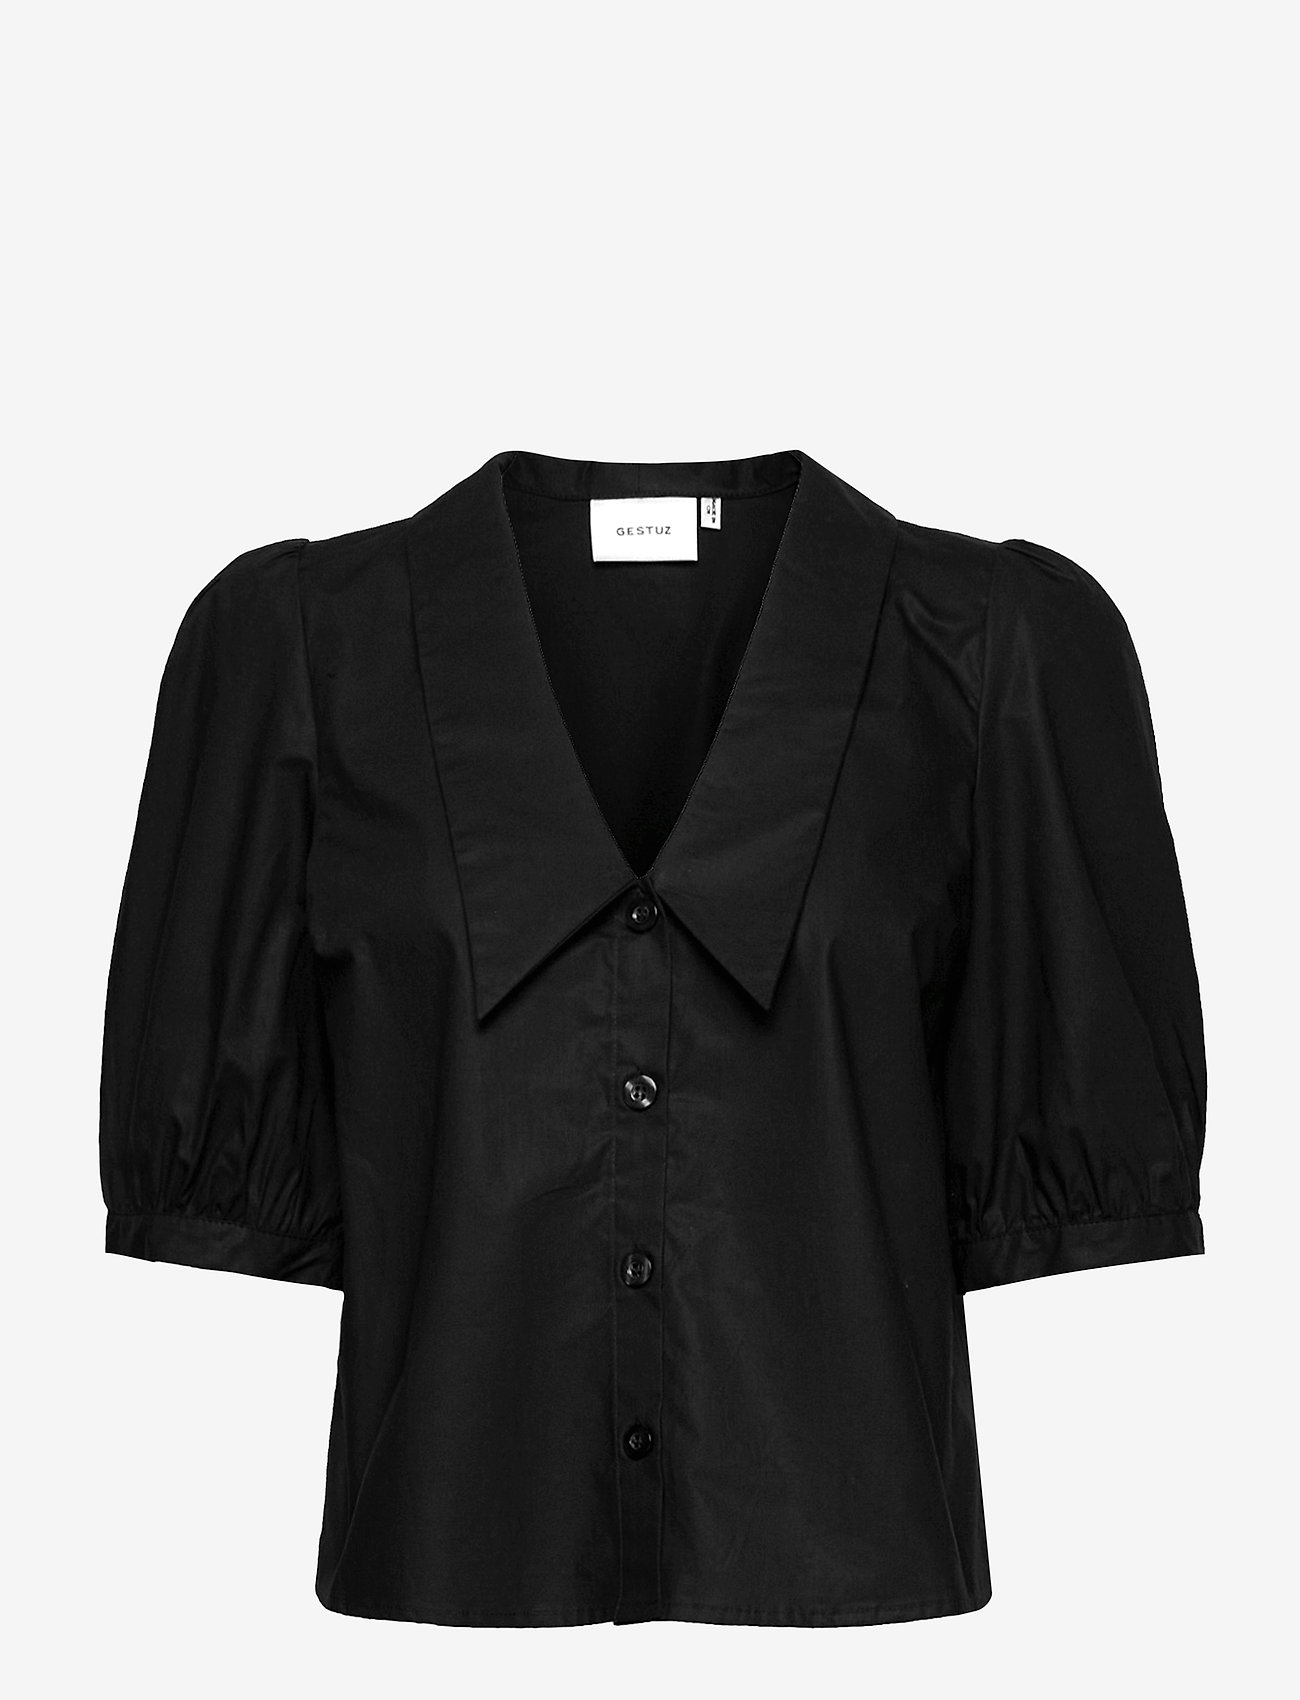 Gestuz - BrietGZ ss shirt - kortærmede bluser - black - 0